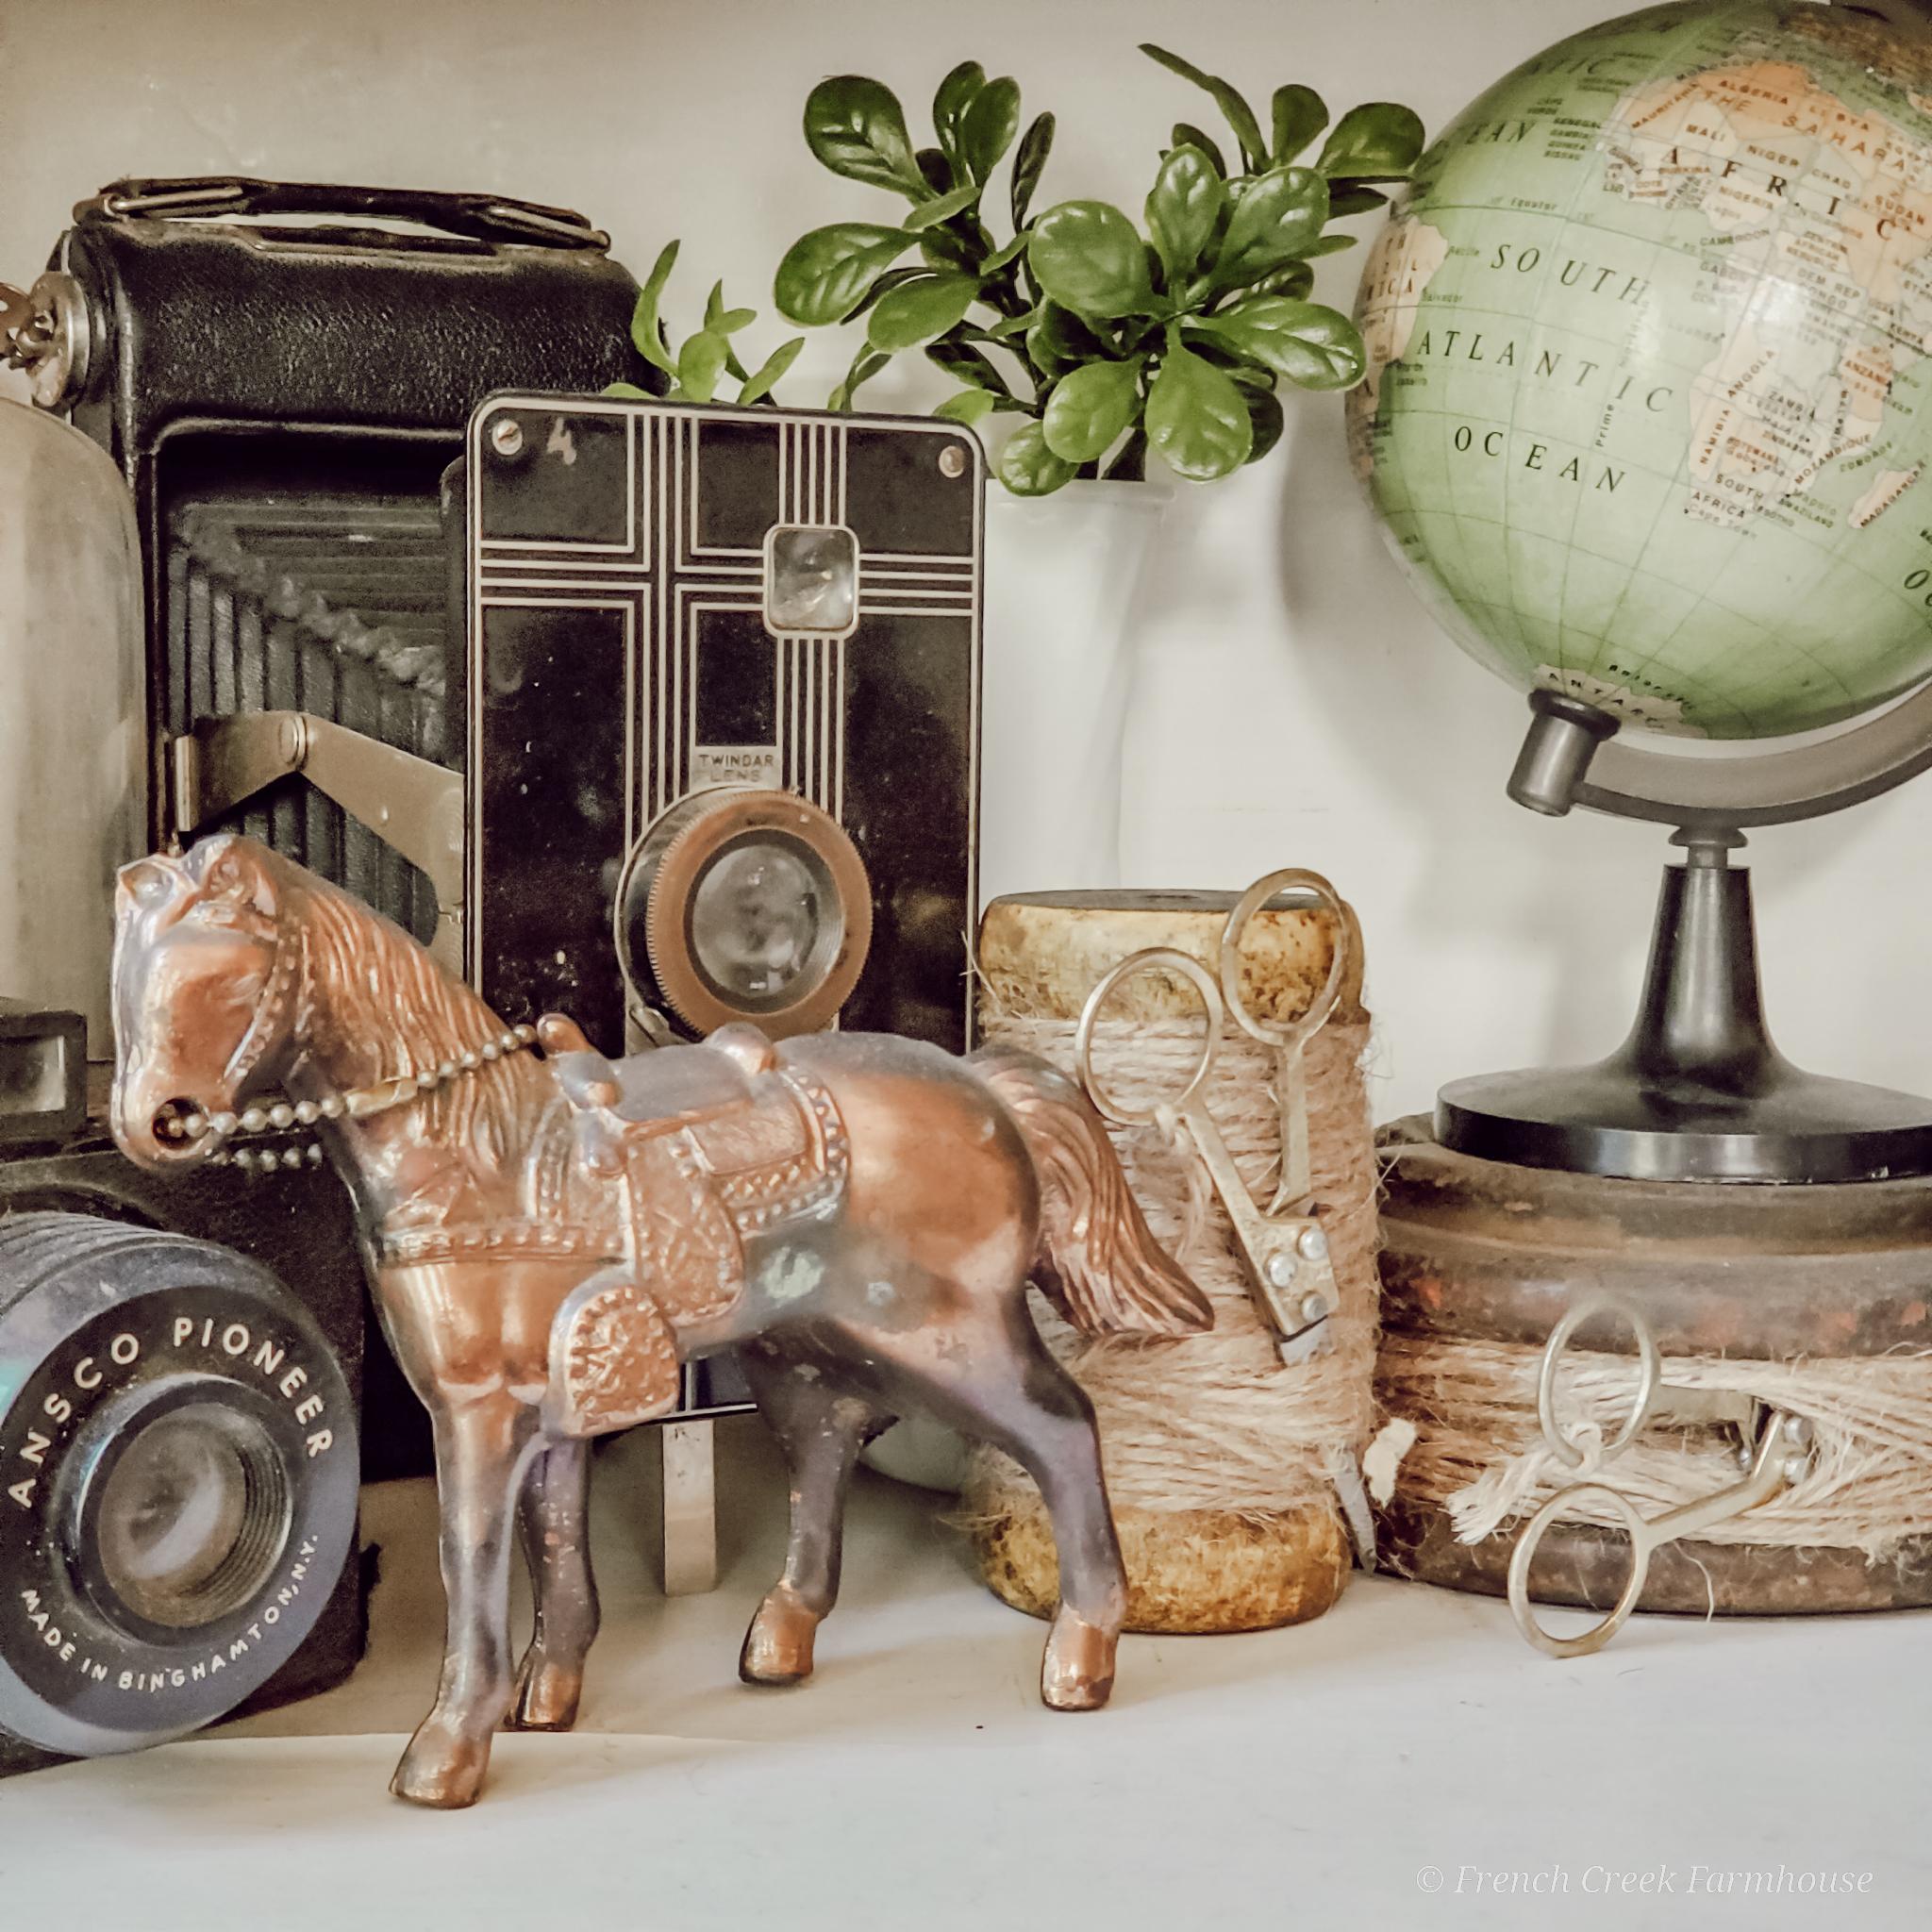 Vintage Finds & Farmhouse Favorites: Treasure Hunting